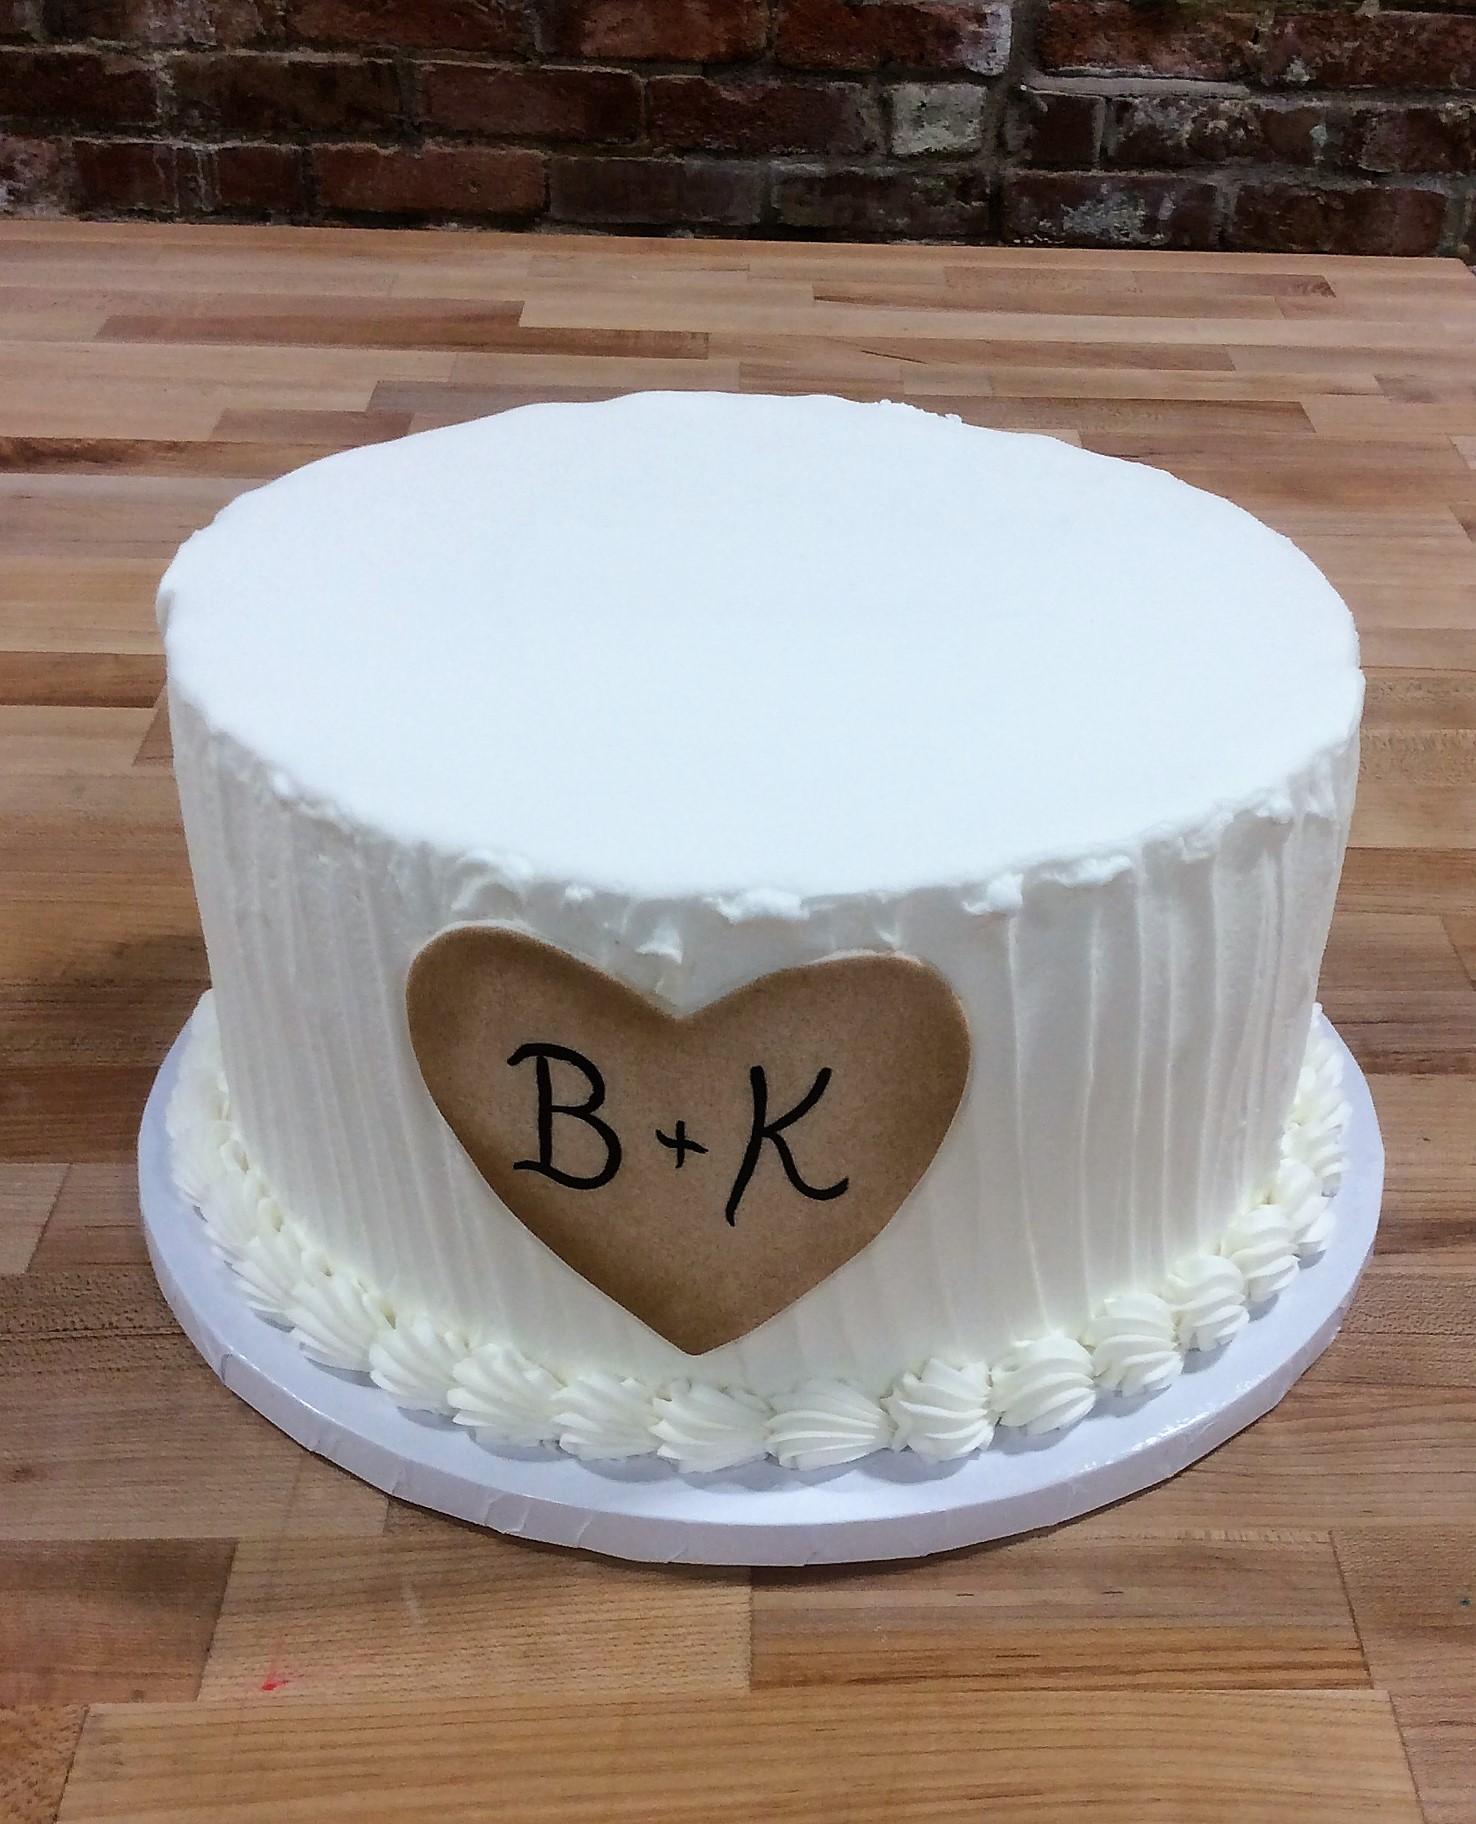 Round Cake with Fondant Heart